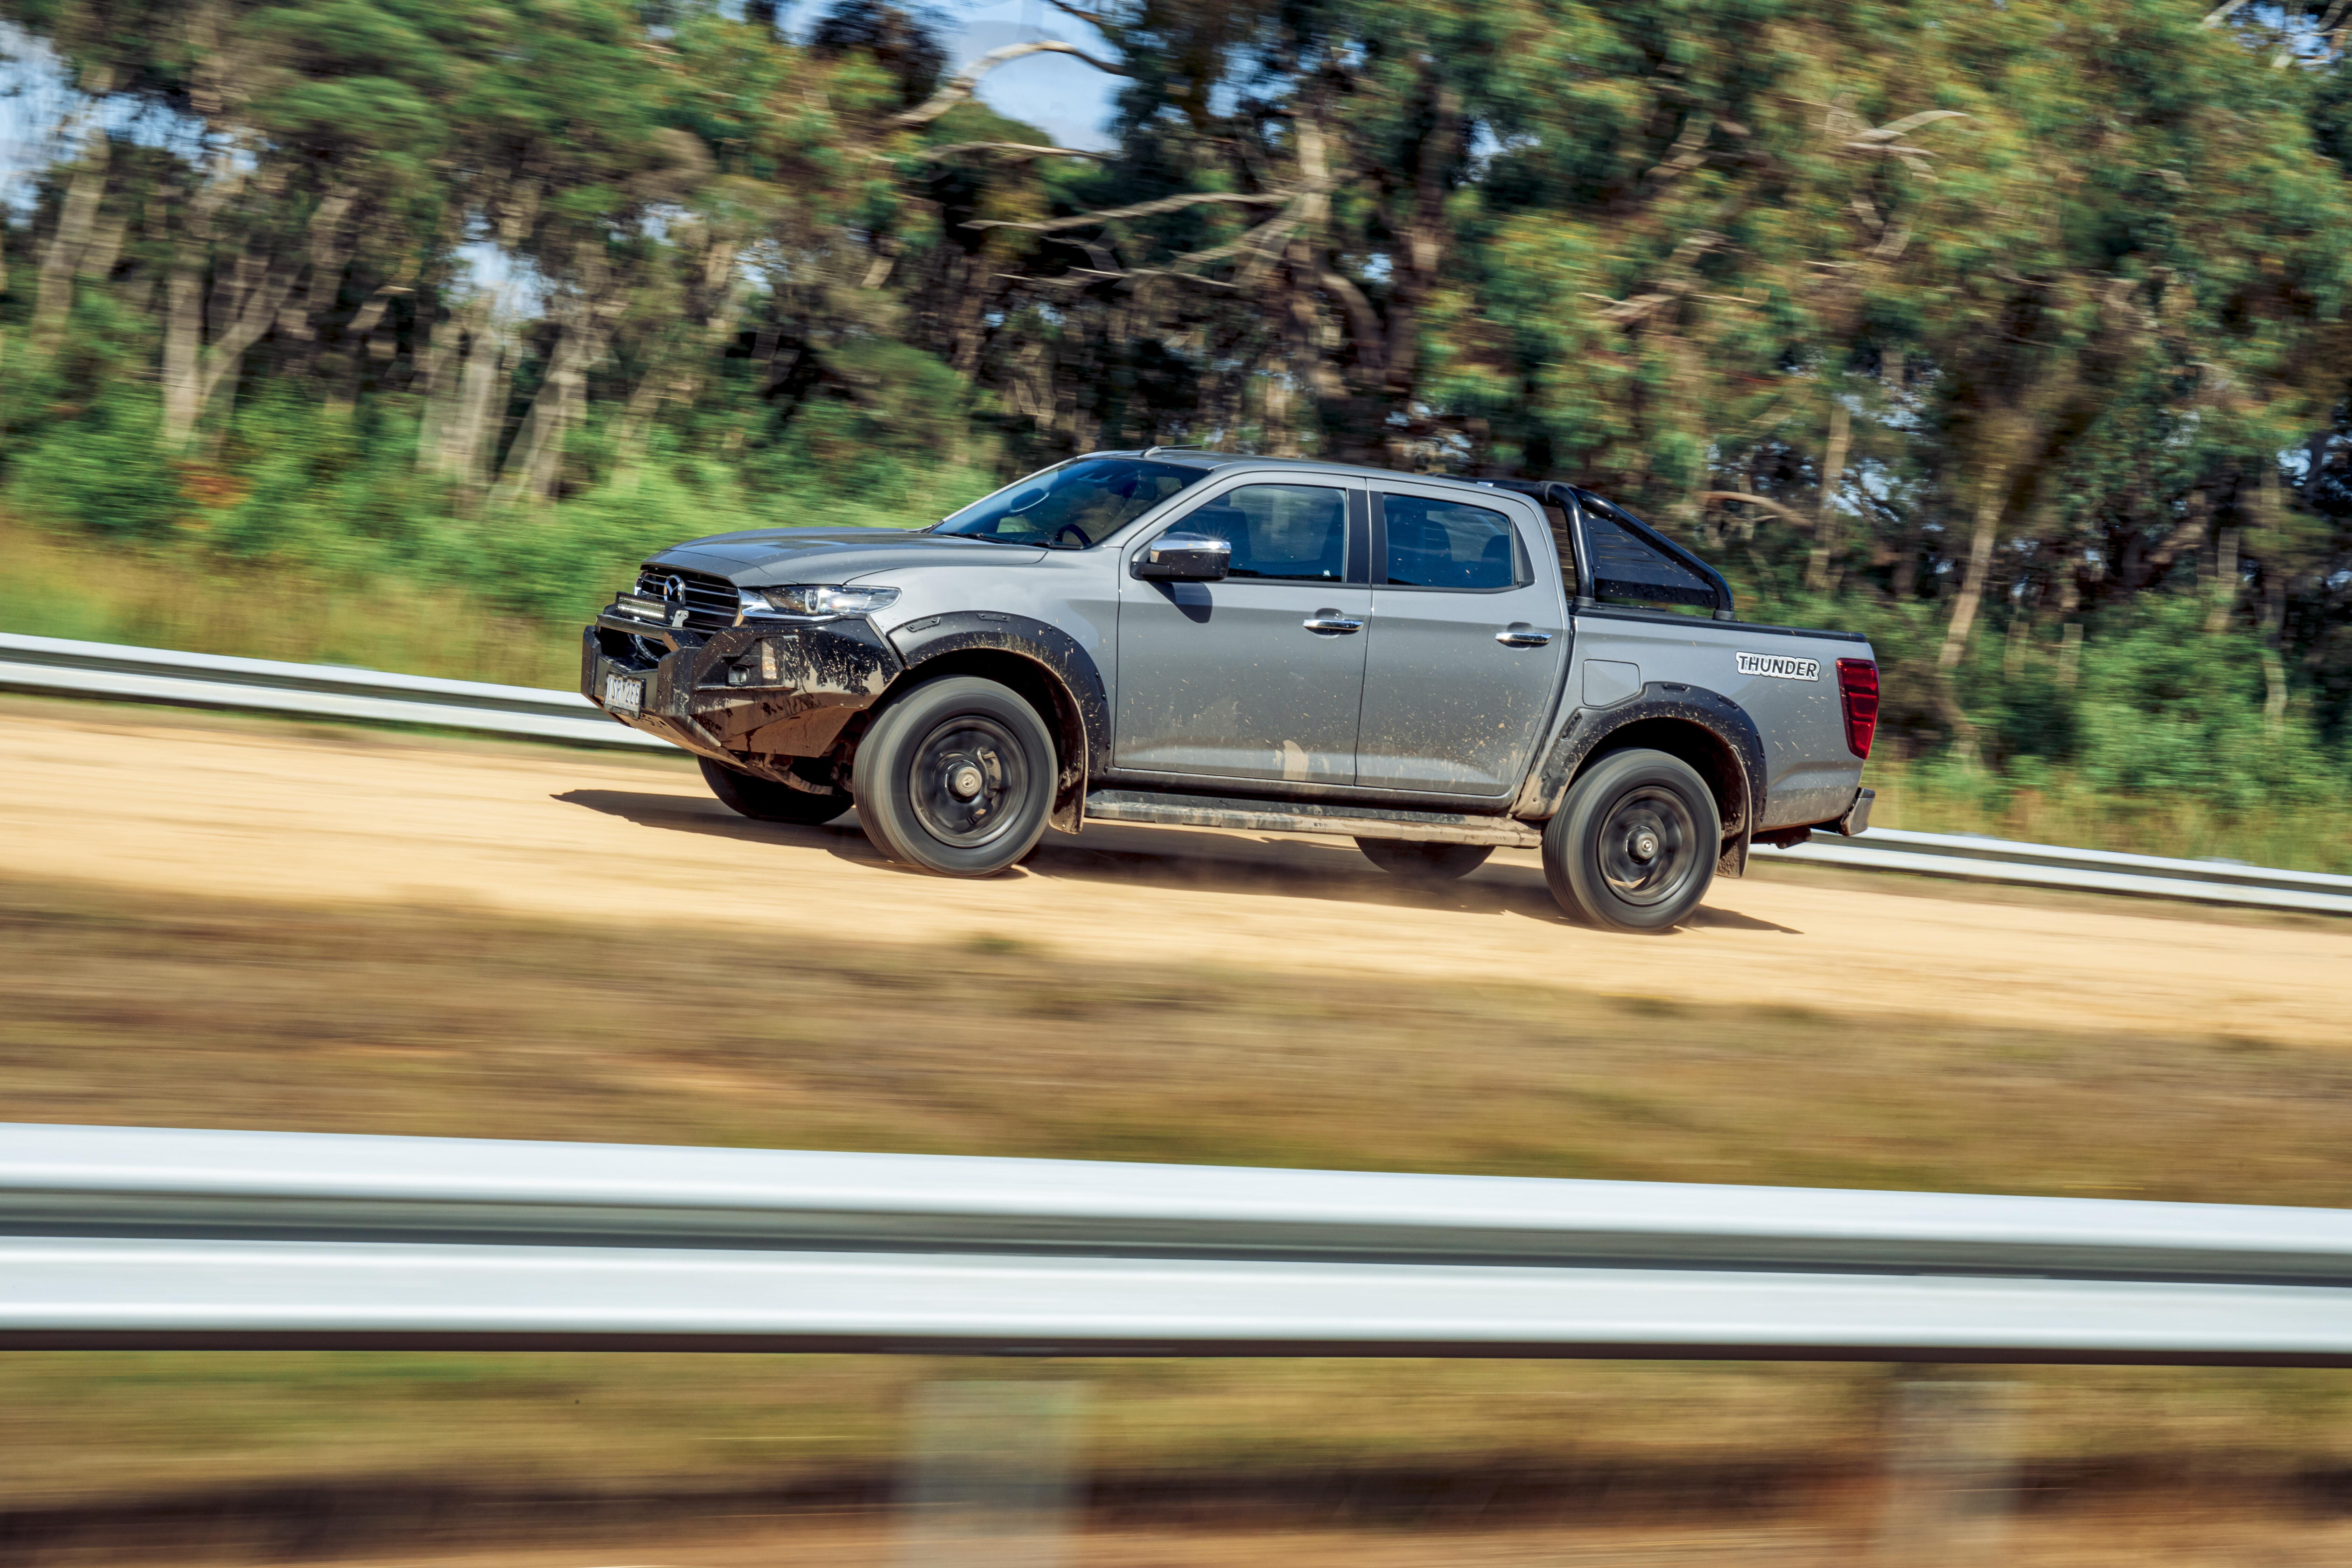 4 X 4 Australia Comparisons 2021 May 21 Mazda BT 50 Thunder Off Road Ride Drive